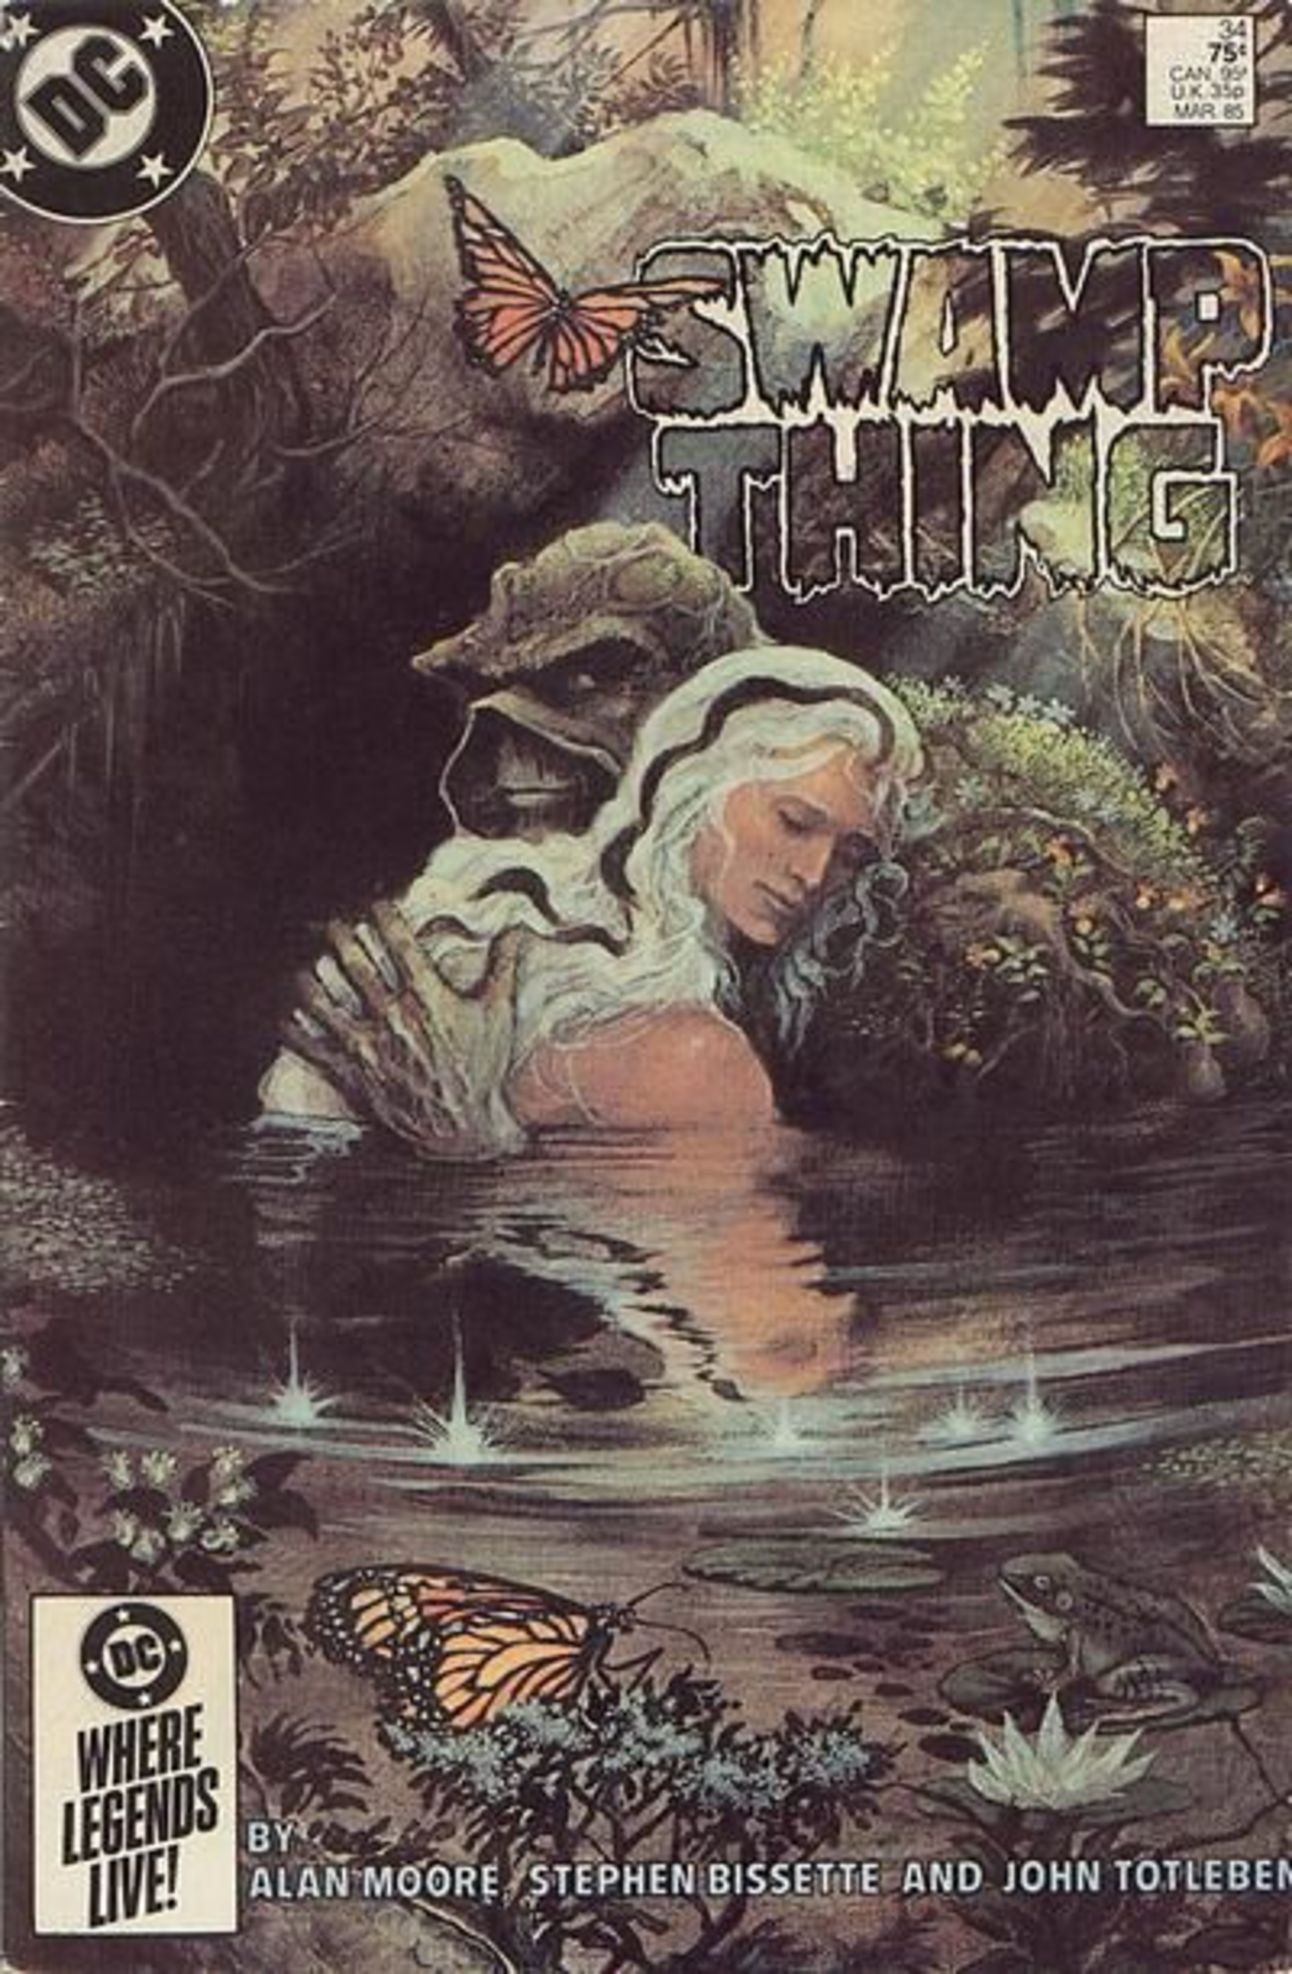 Swamp_Thing_Vol_2_34